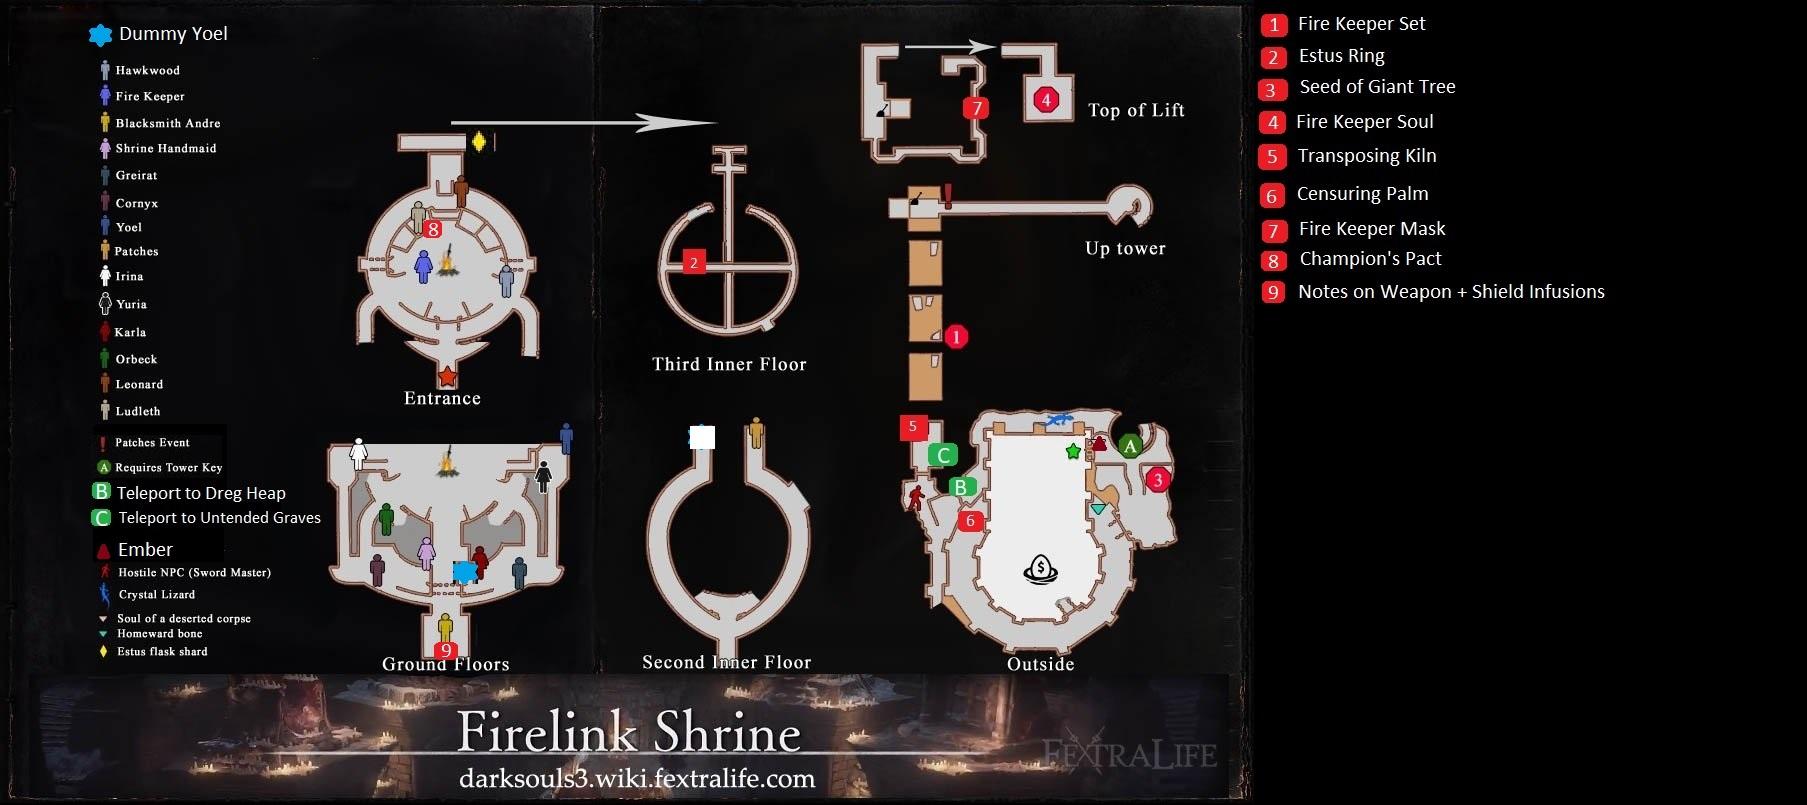 firelink_shrine_map.jpg